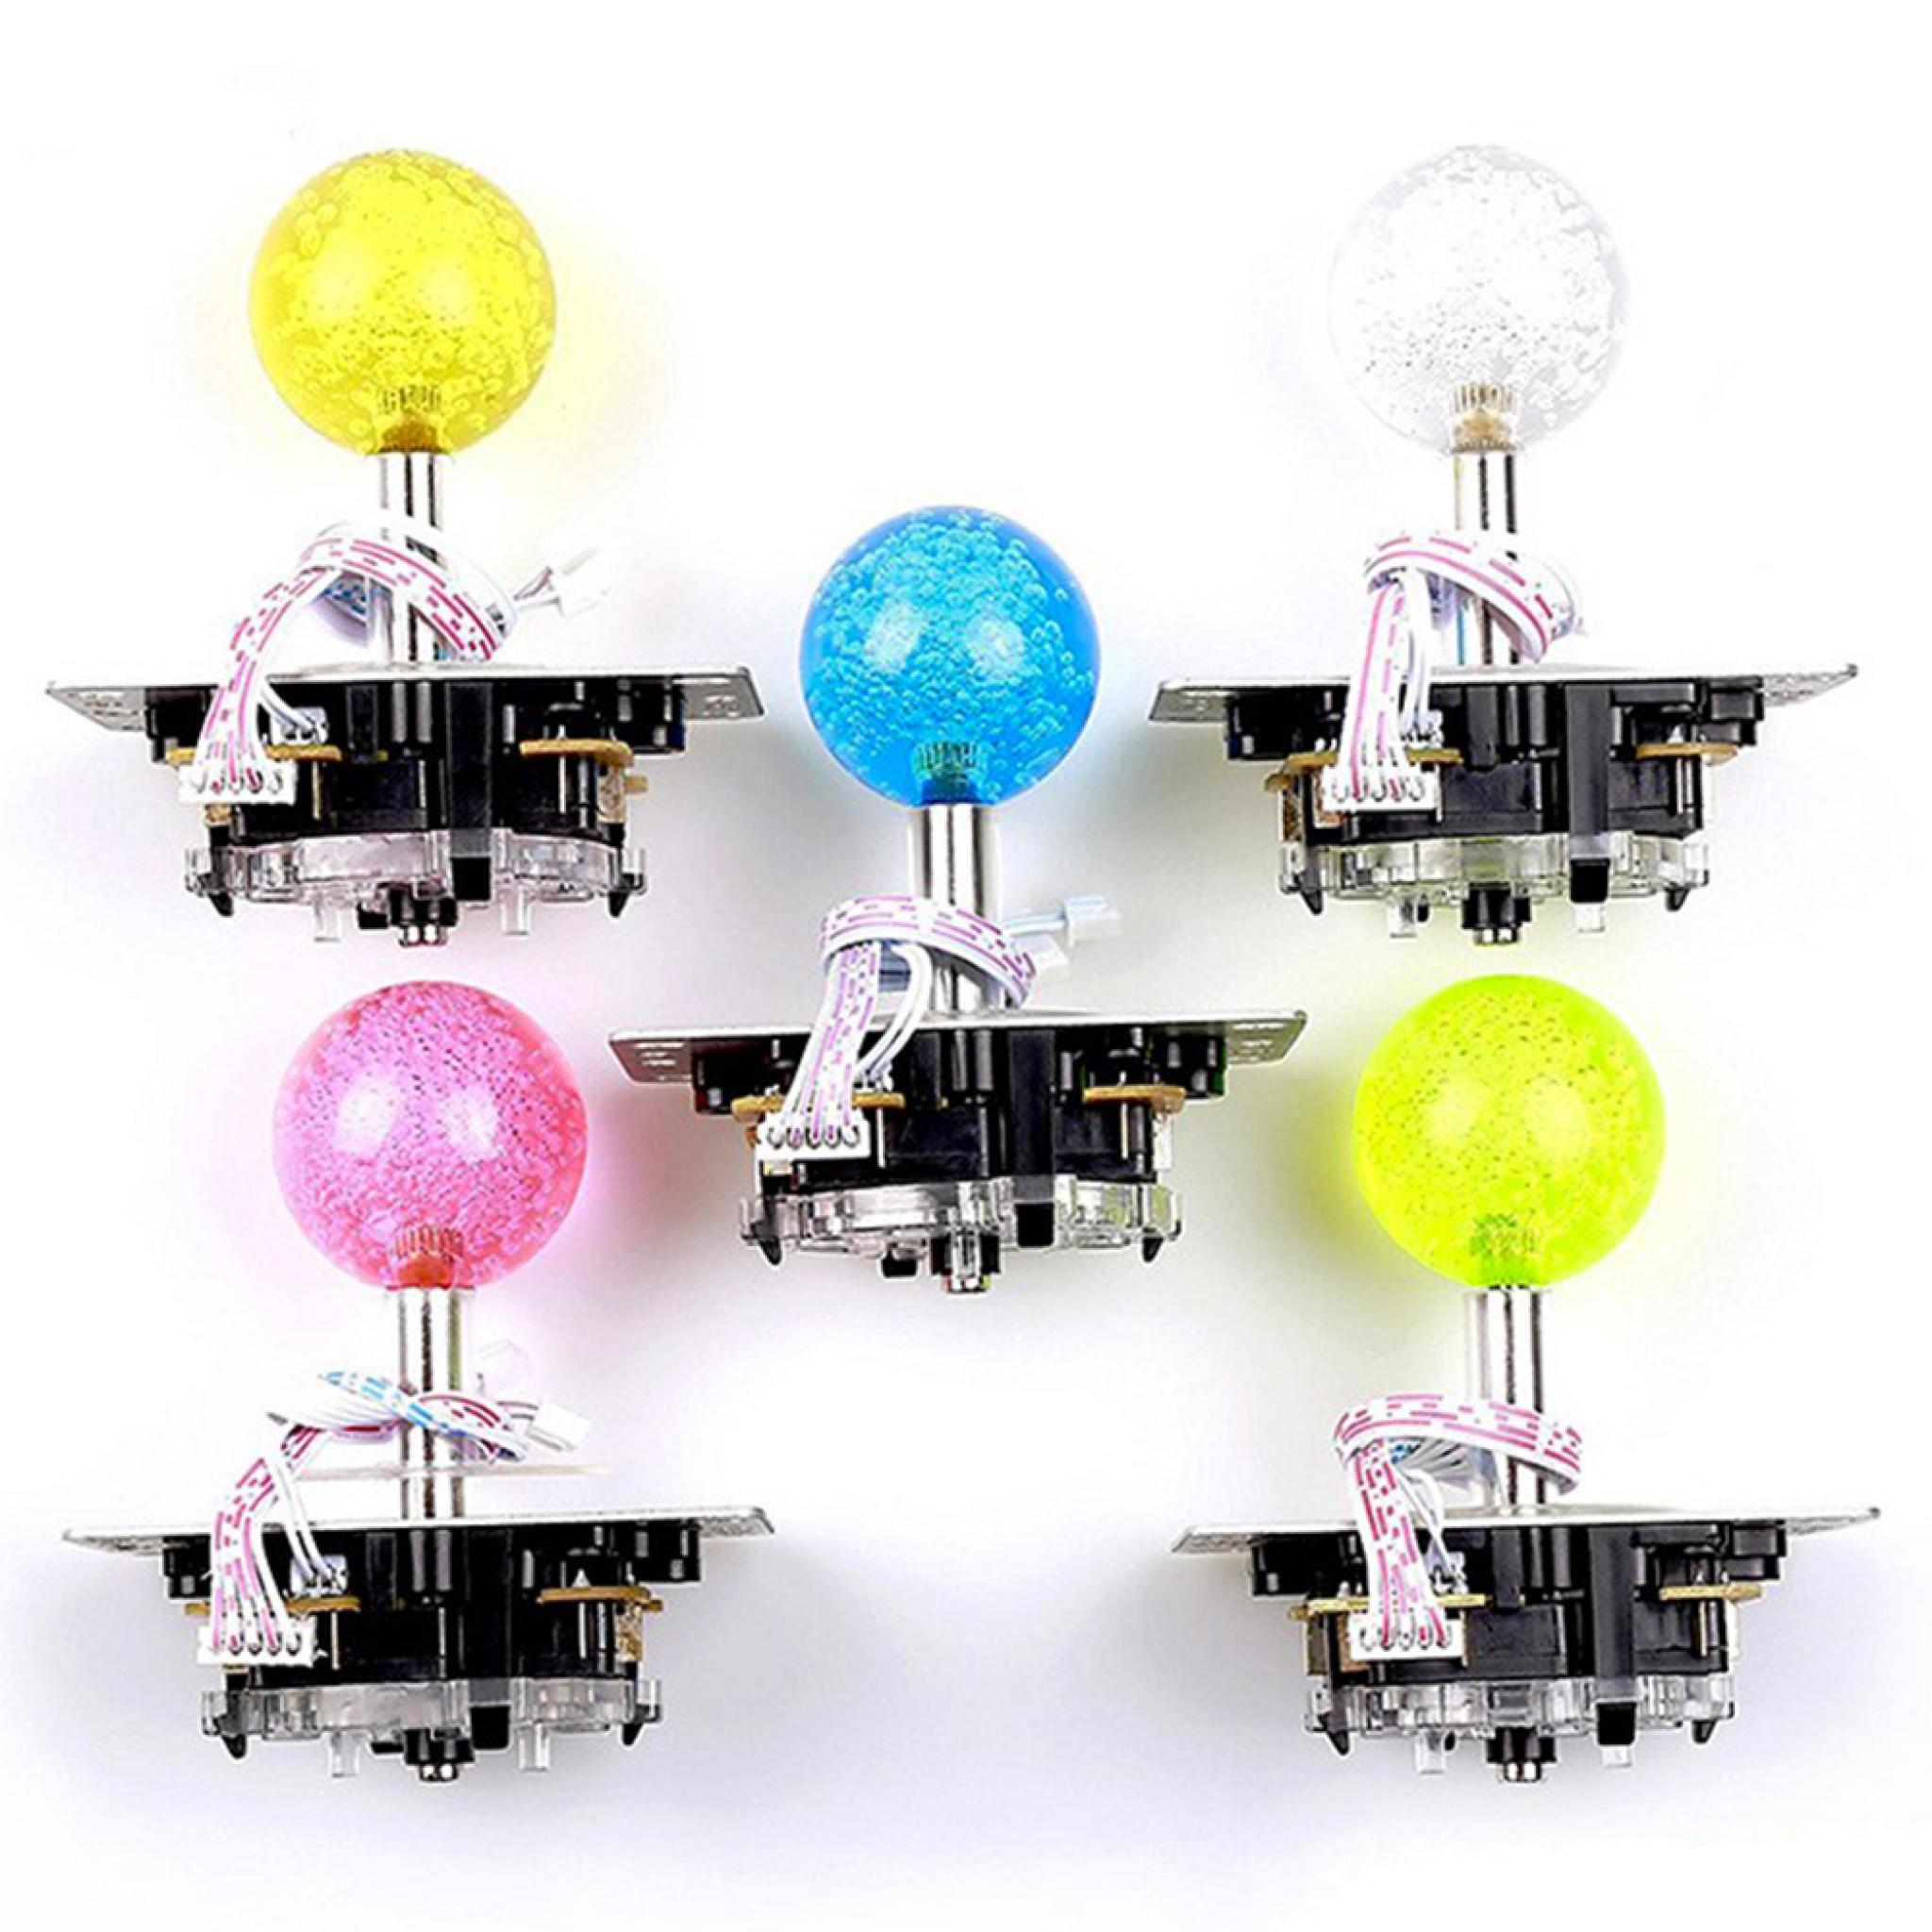 kit-arcade-mame-led-generico-1-jugador-completo-1510-718-5